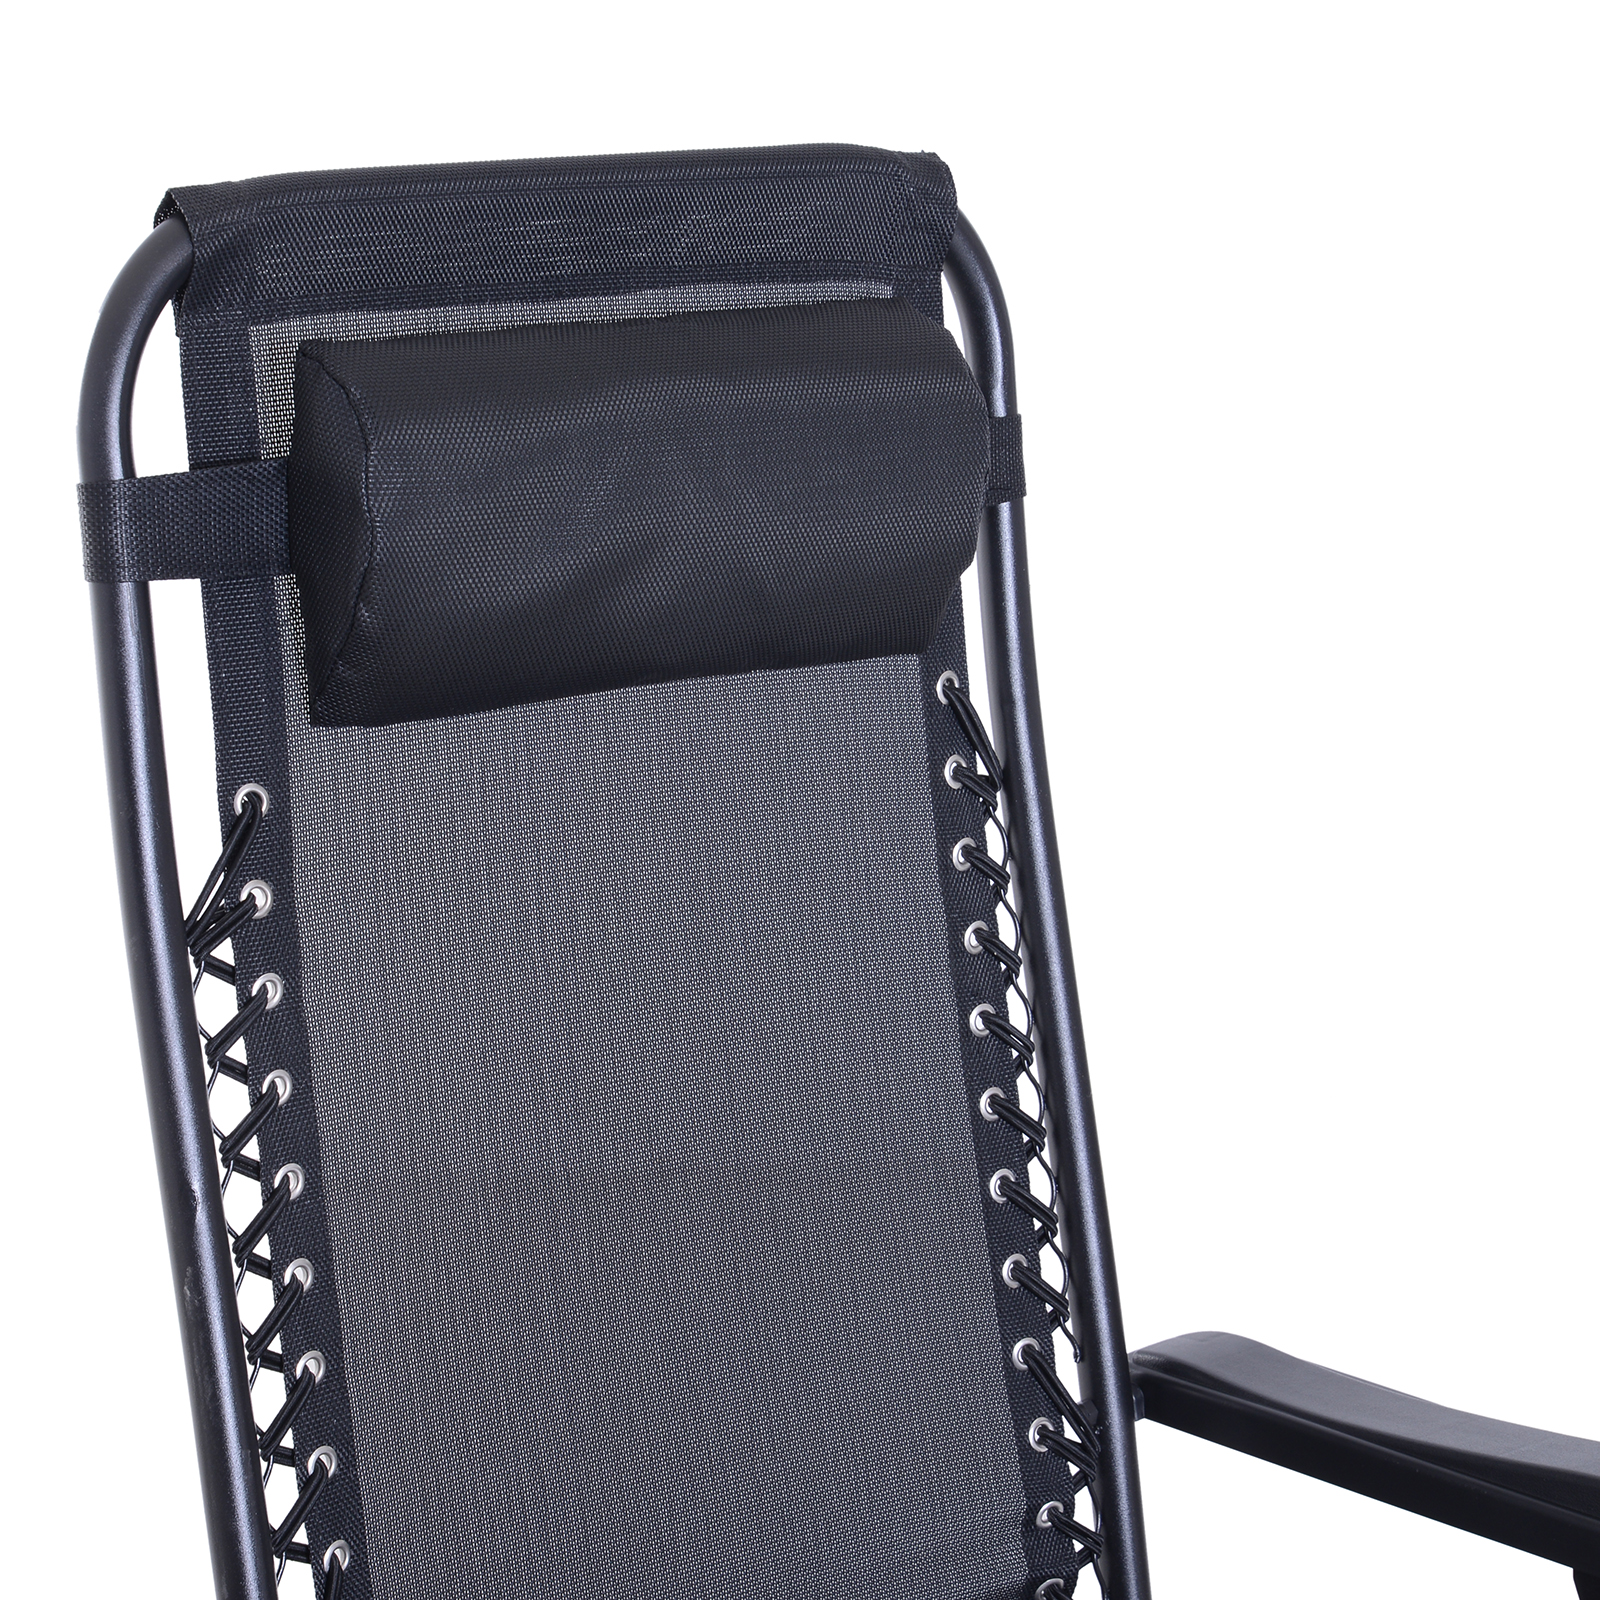 Zero Gravity Recliner Lounge Chair Patio Rocker Home